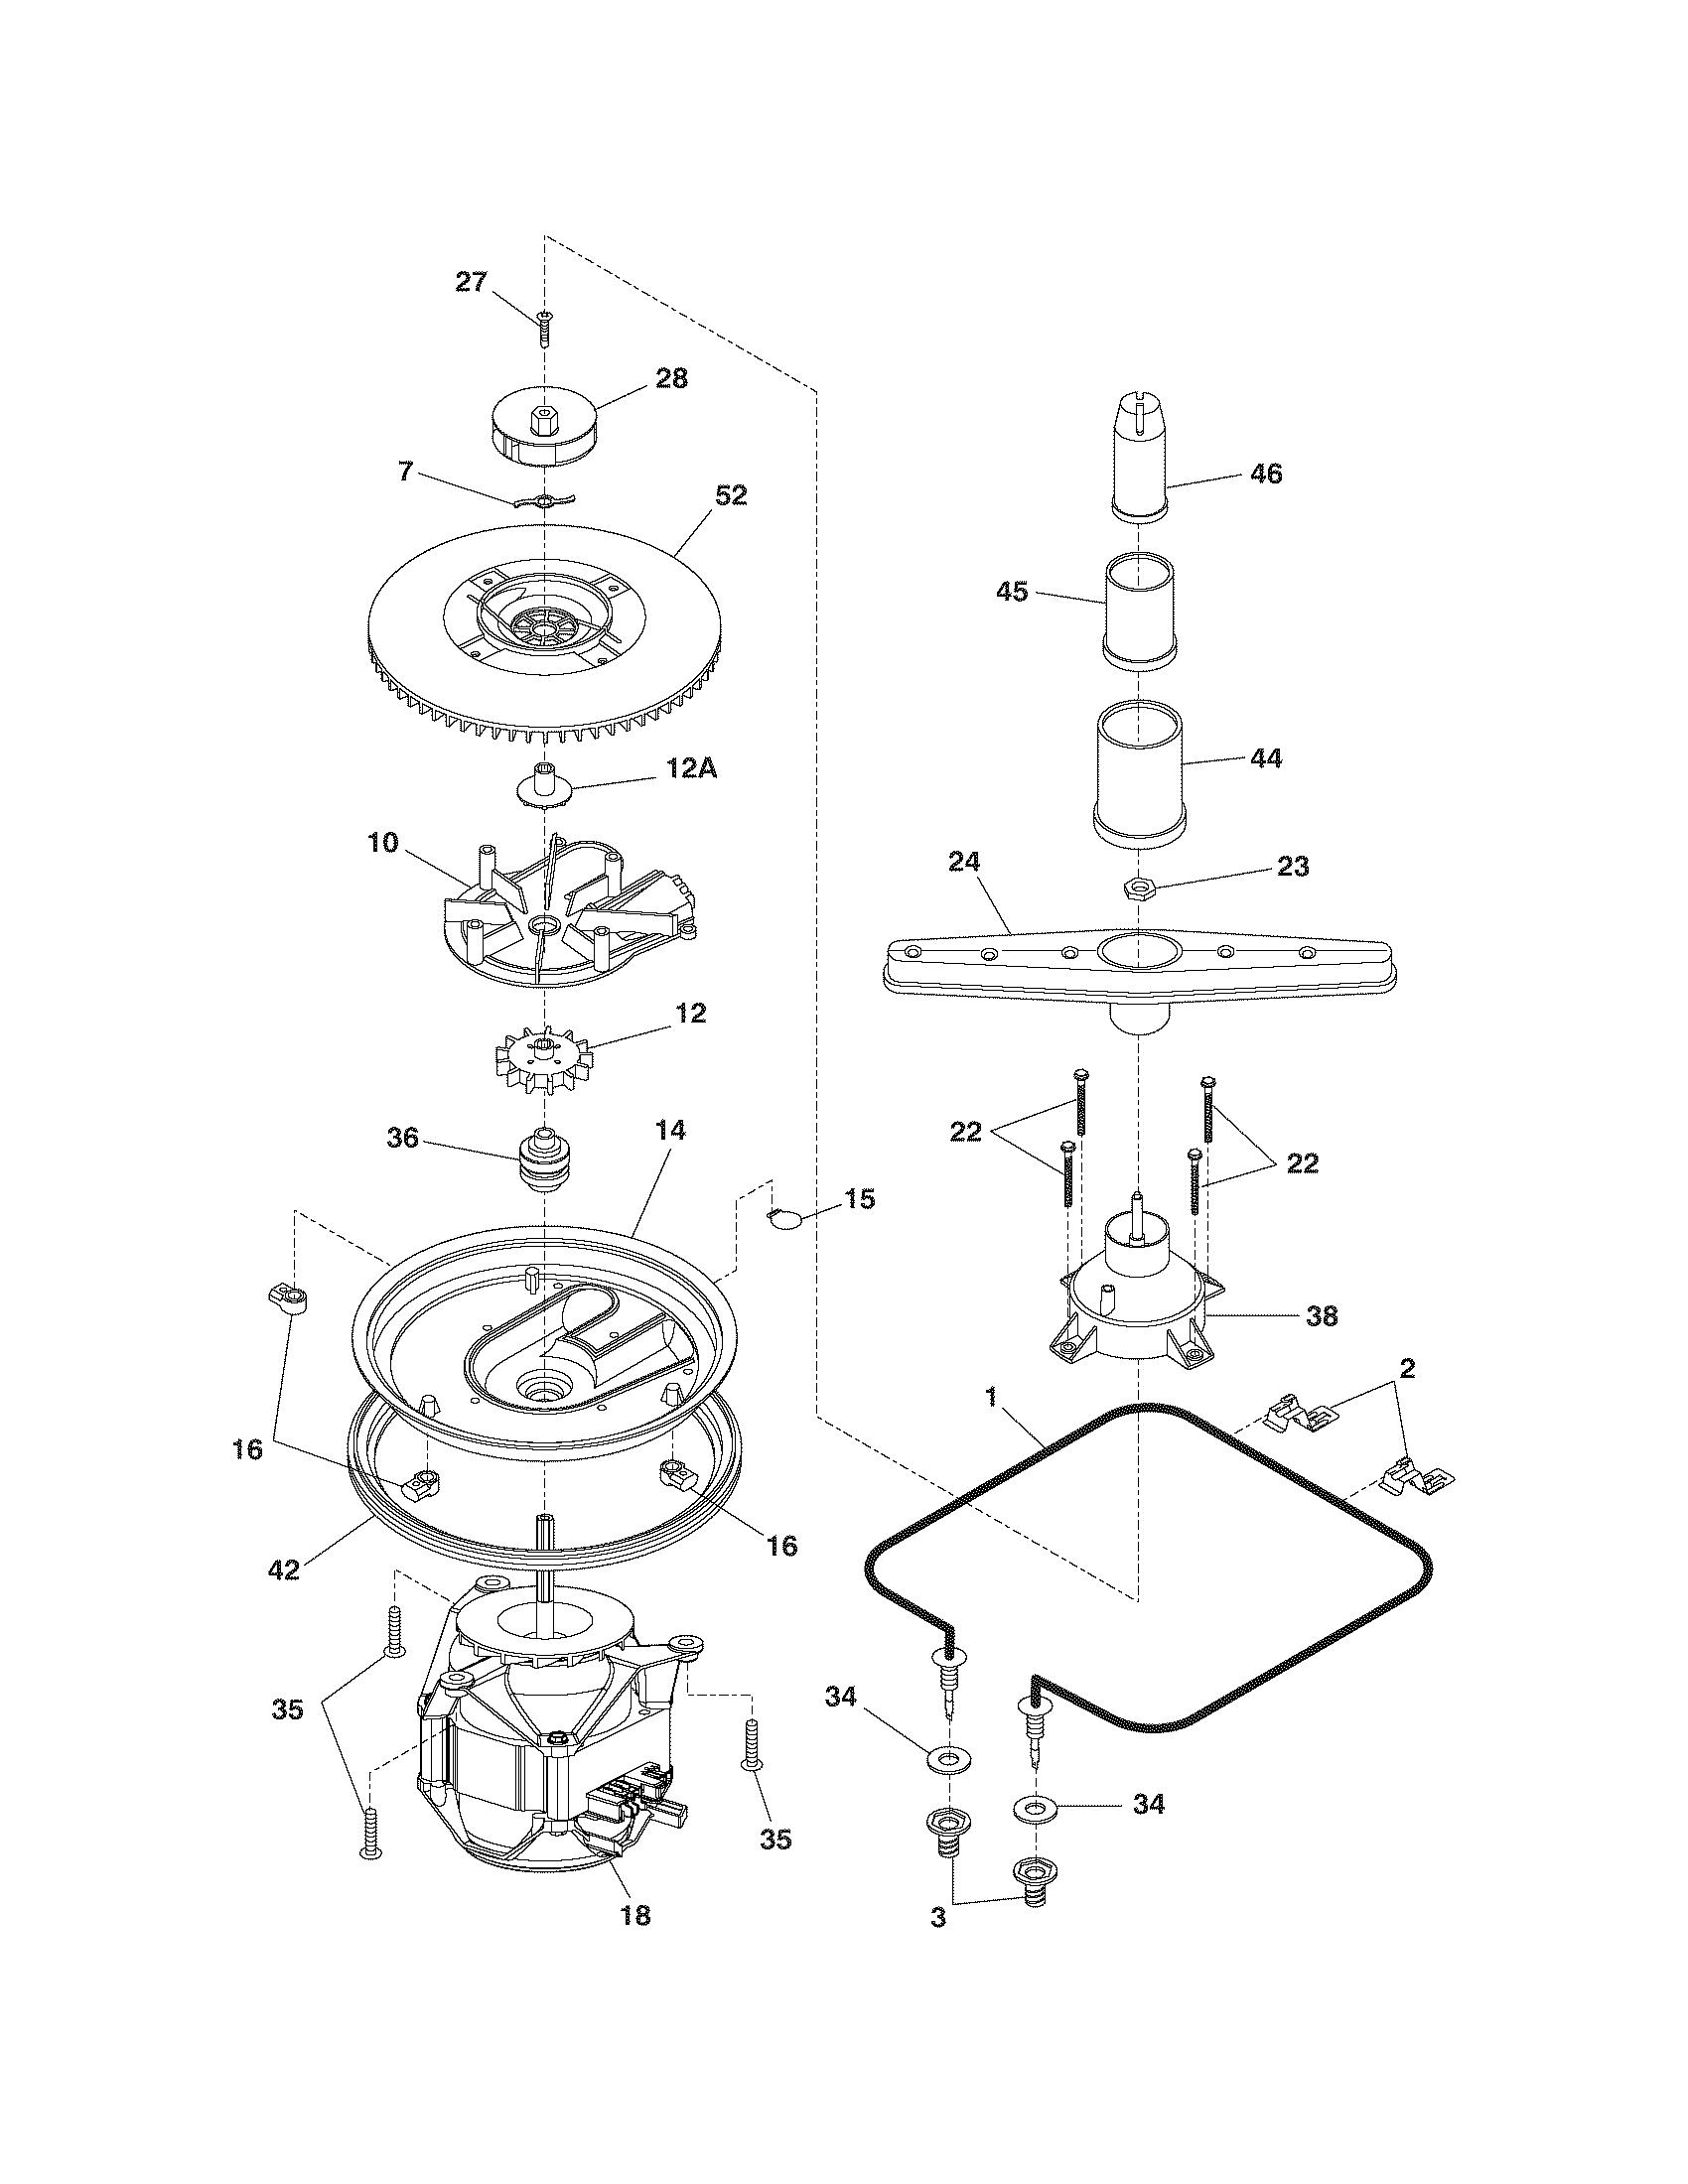 MOTOR & PUMP Diagram & Parts List for Model FDR252RBB2